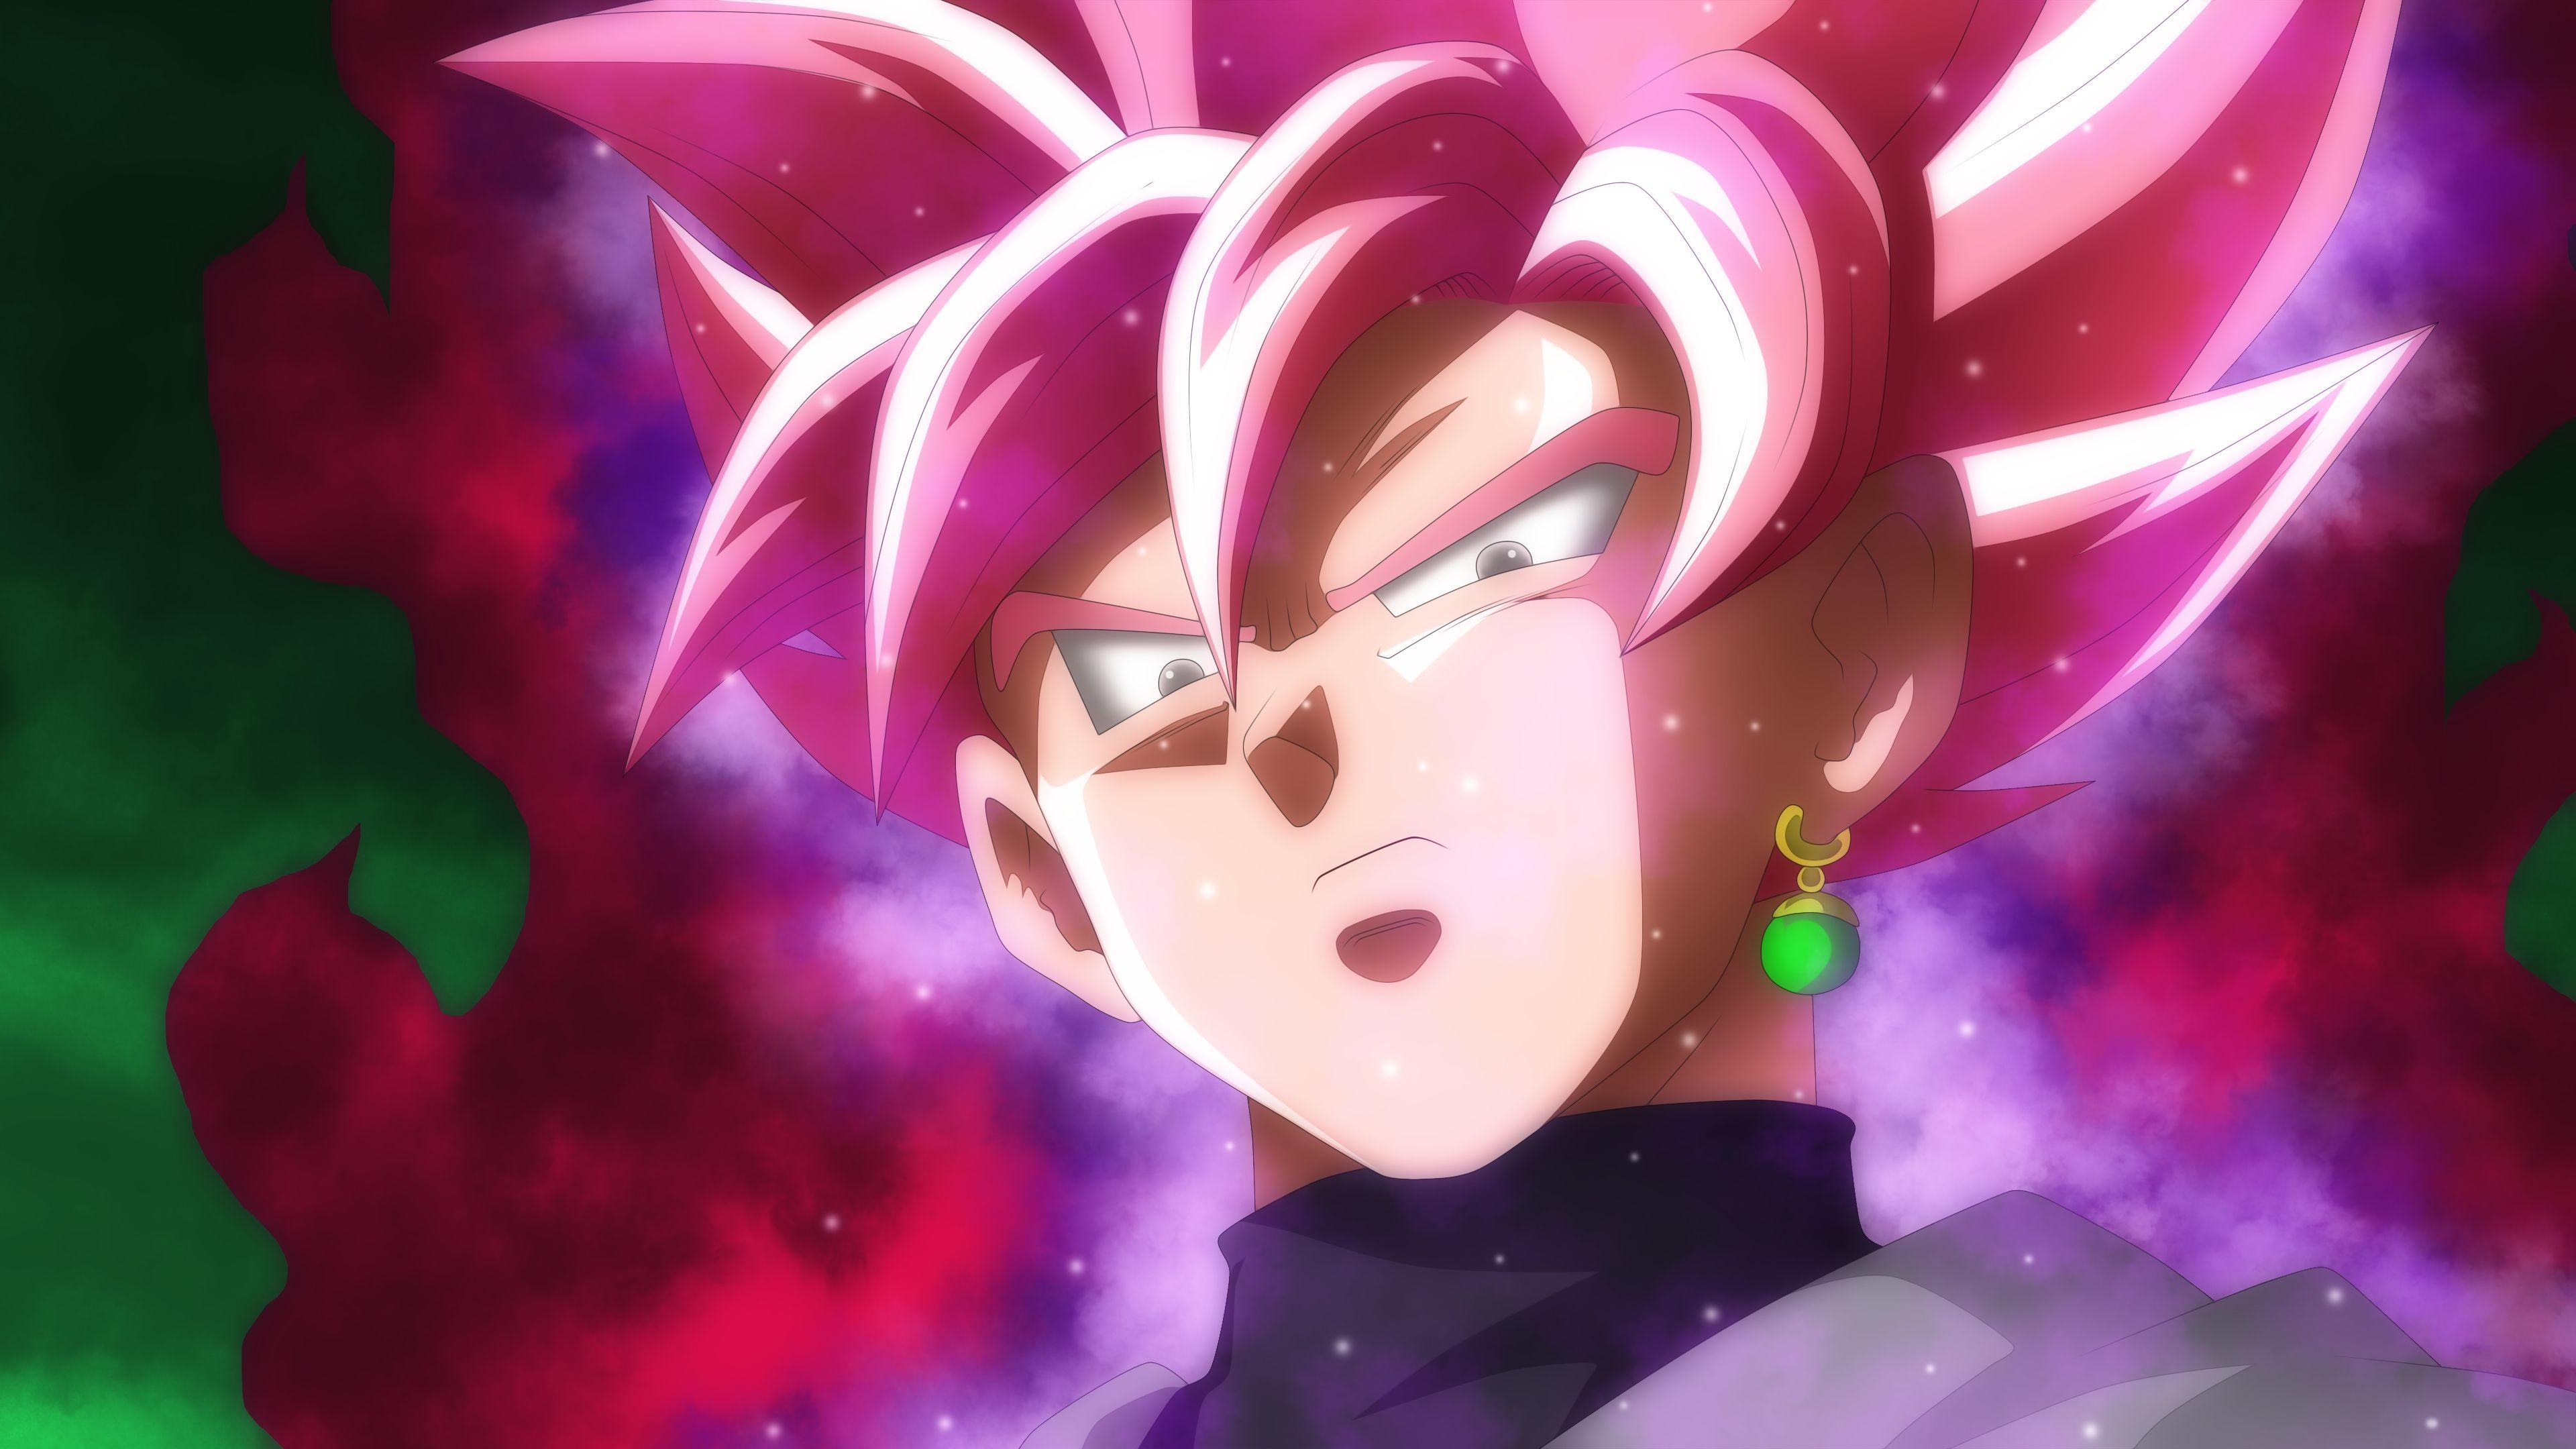 Goku Black Super Saiyan Rose Dragon Ball Super 4k 1091 Goku Black Goku Black Super Saiyan Dragon Ball Wallpapers